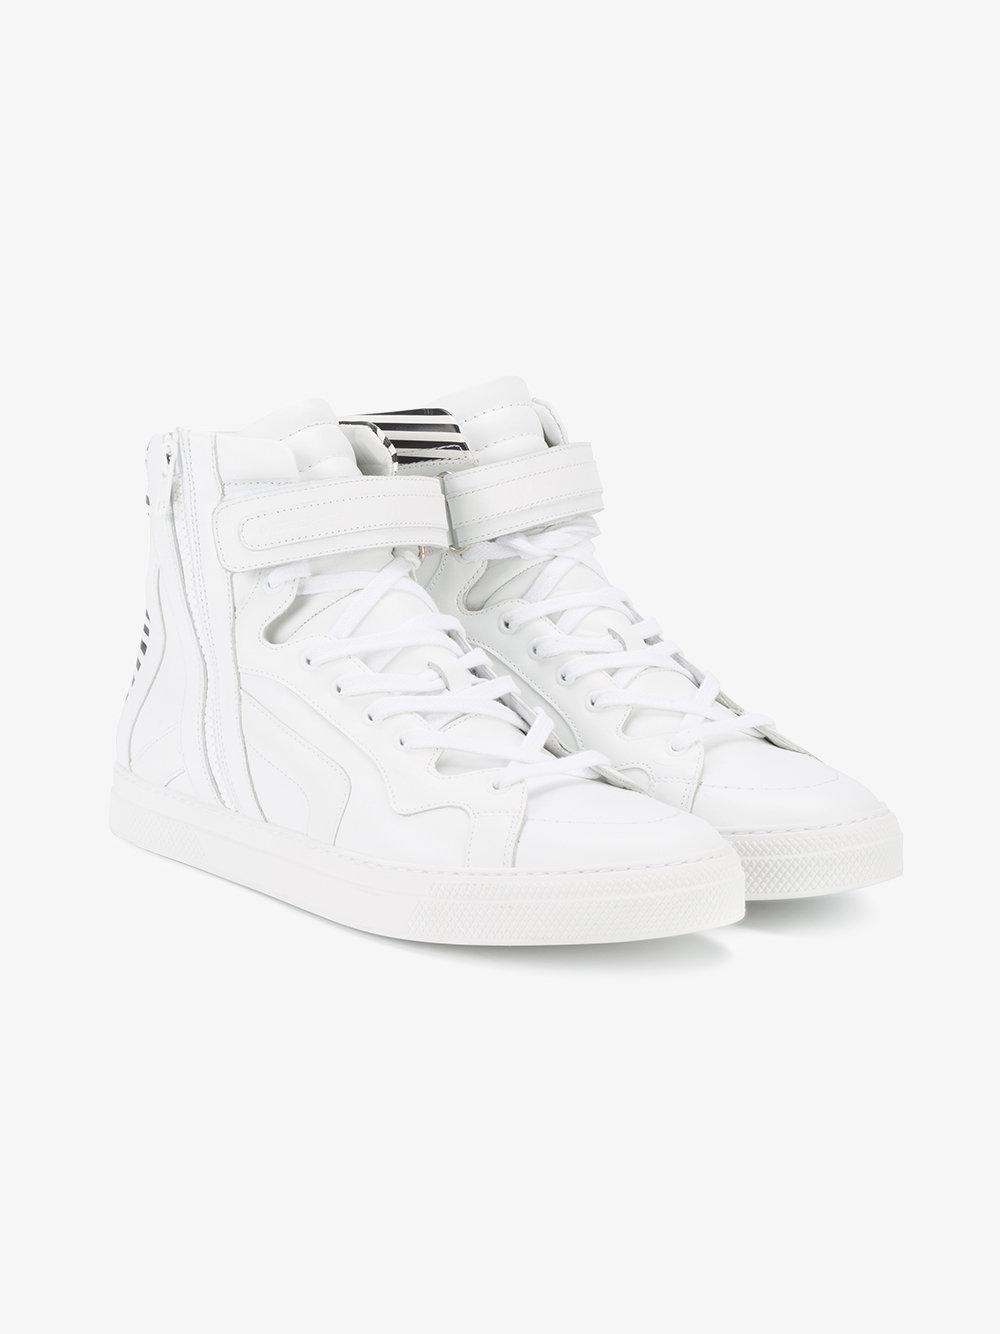 Les Baskets sneakers - White Pierre Hardy Z6ayUtjiej